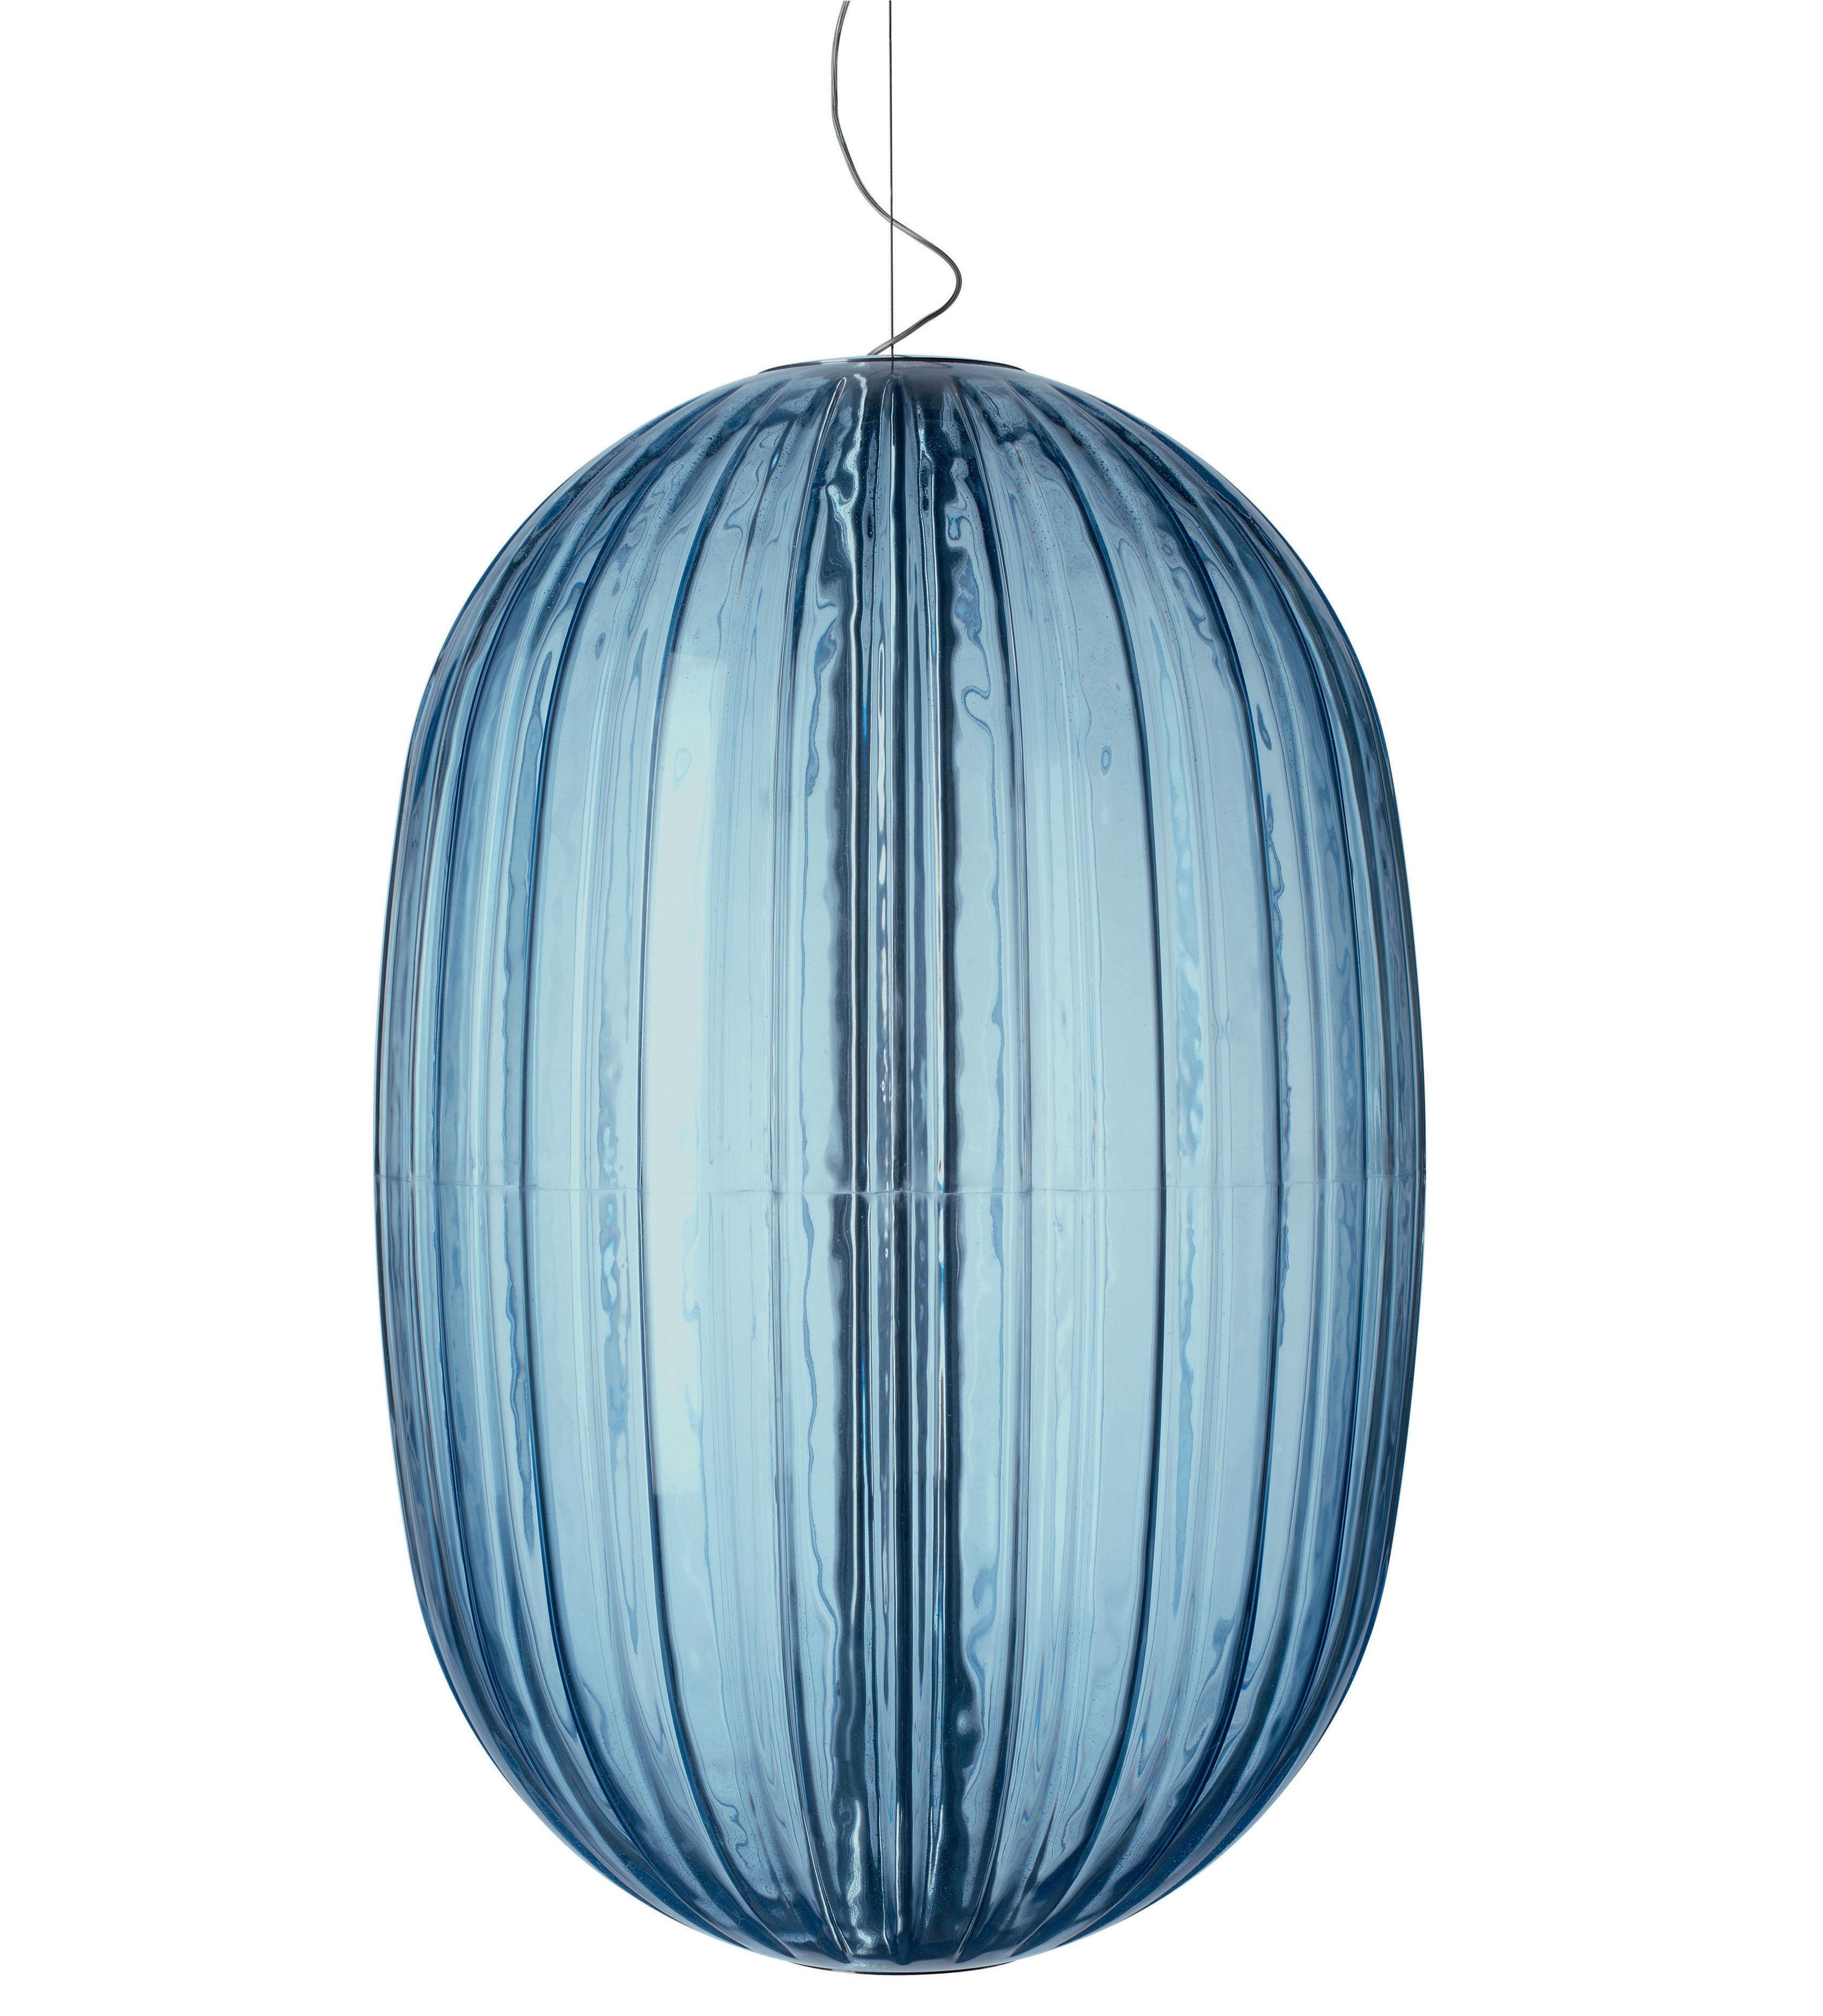 Luminaire - Suspensions - Suspension Plass / Ø 75 x H 114 cm - Foscarini - Bleu - Polycarbonate rotomoulé